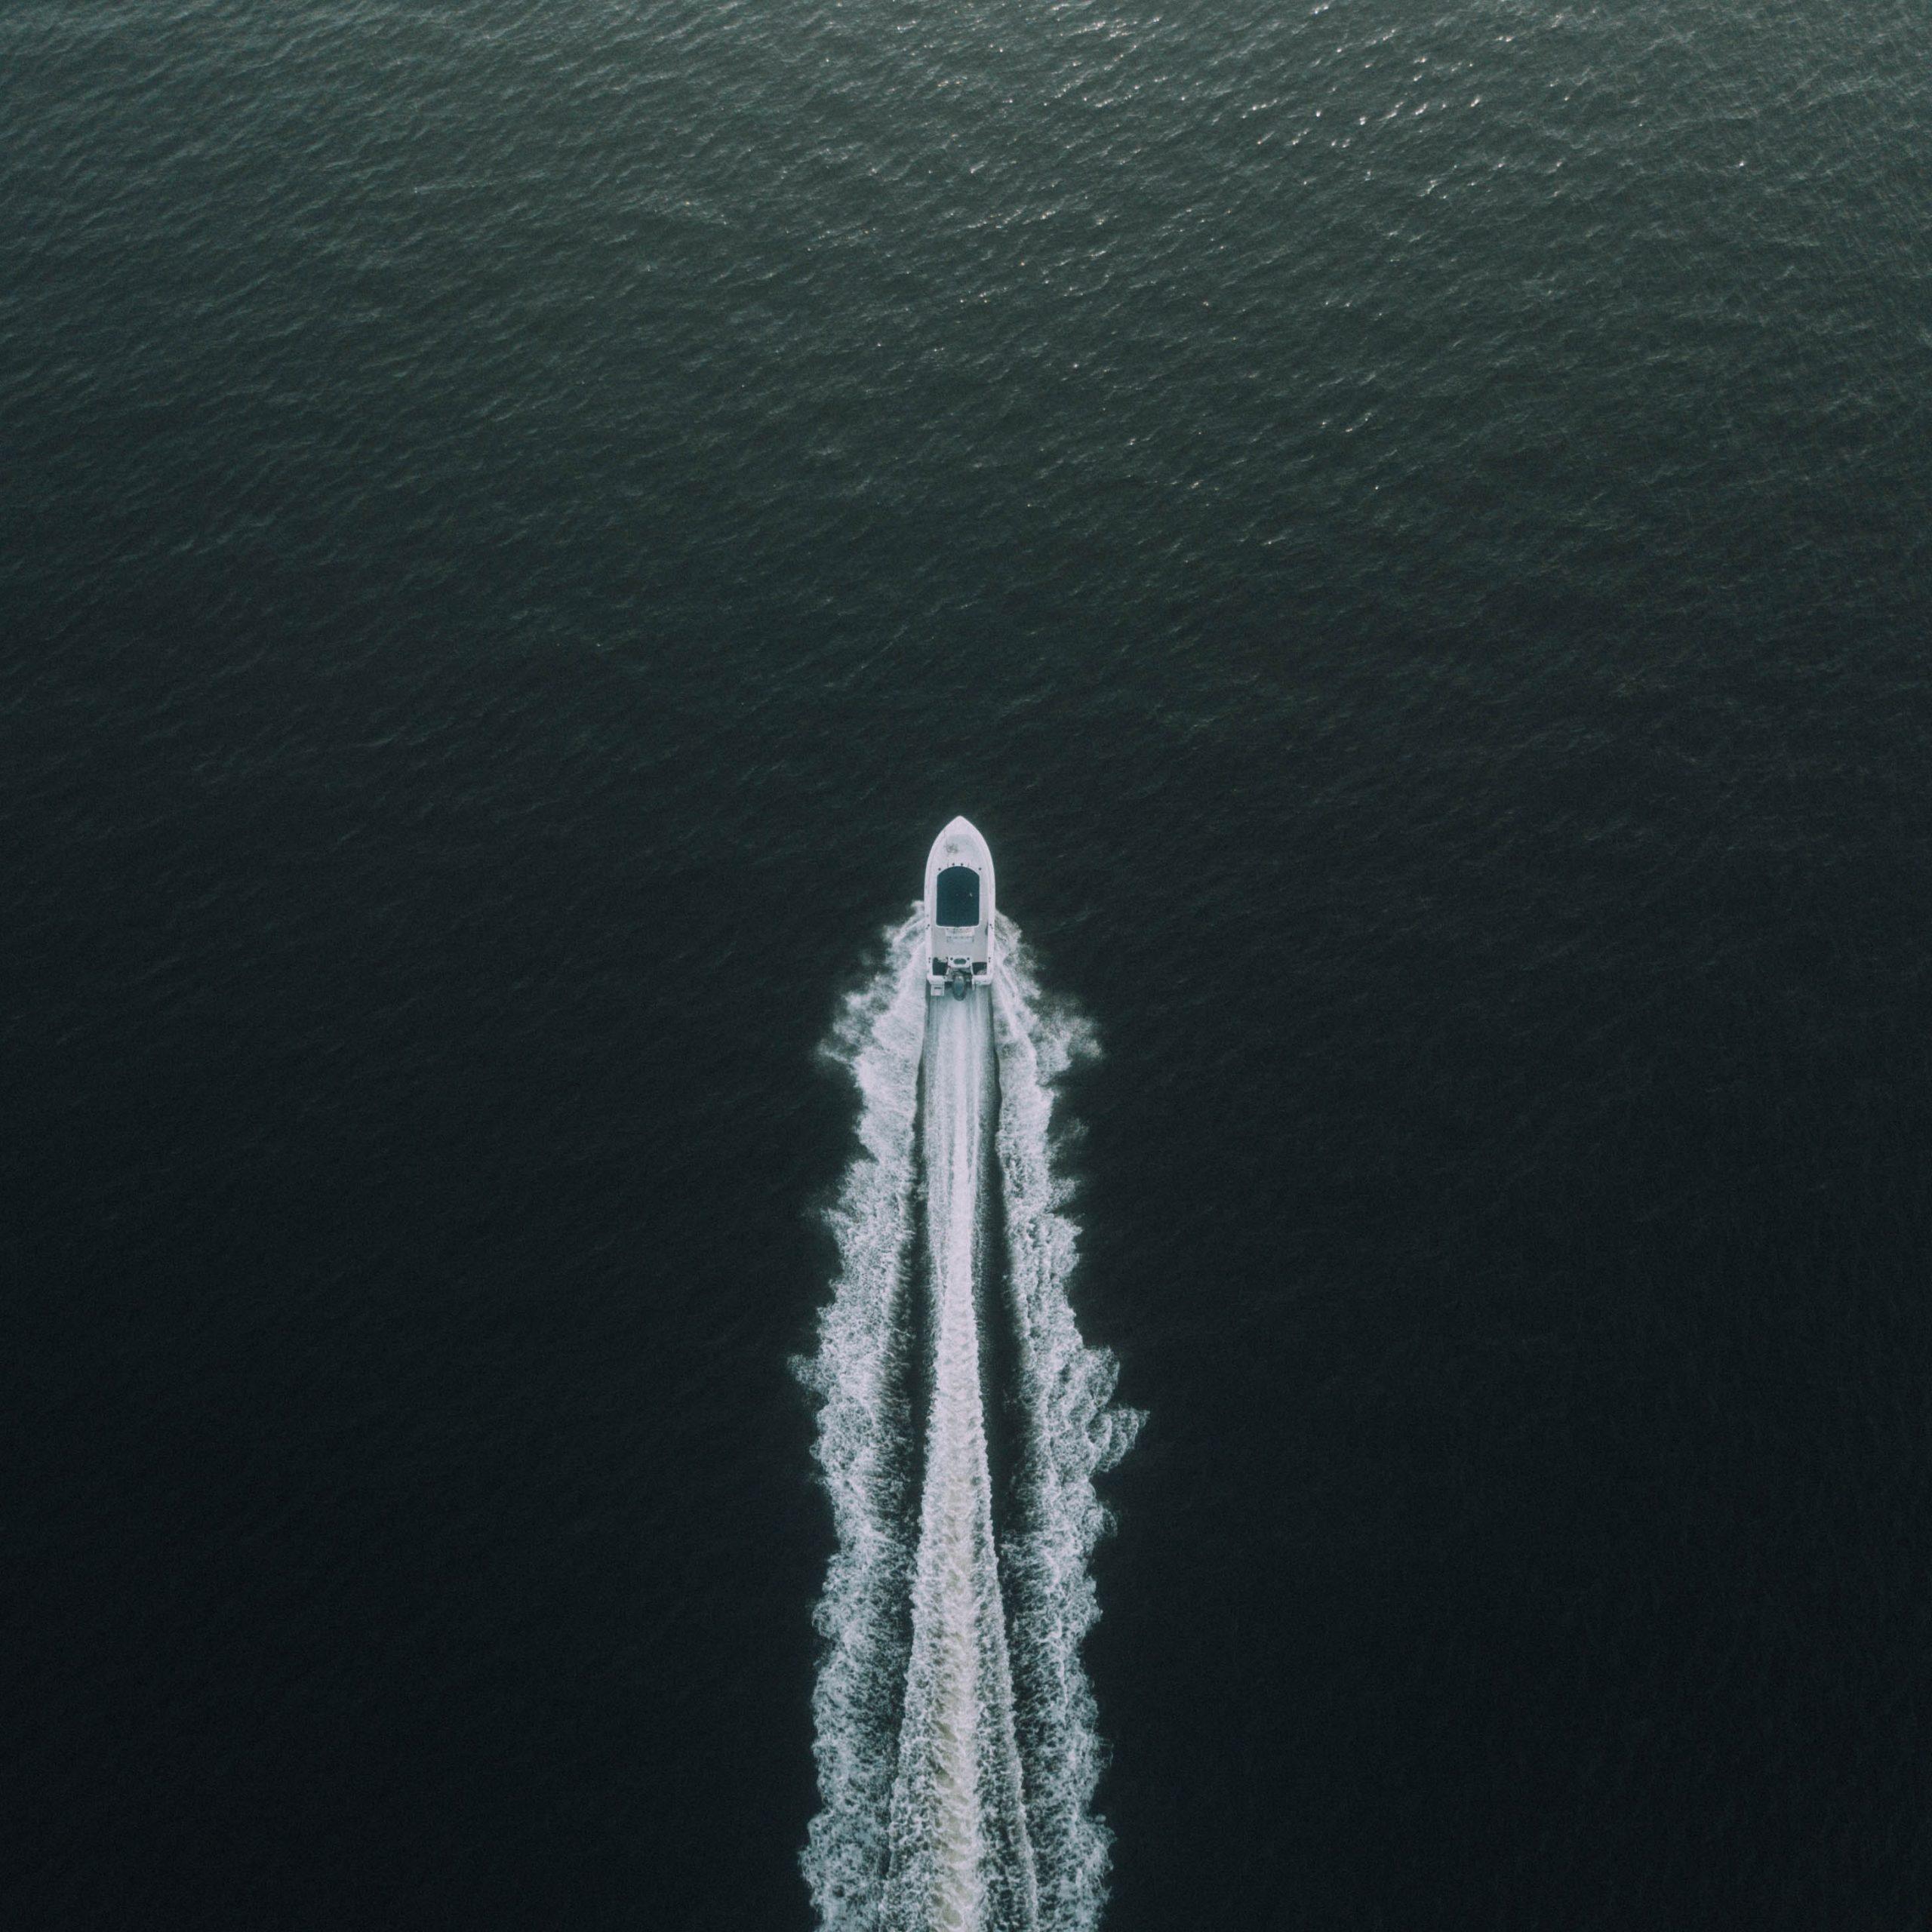 Overhead shot of boat.